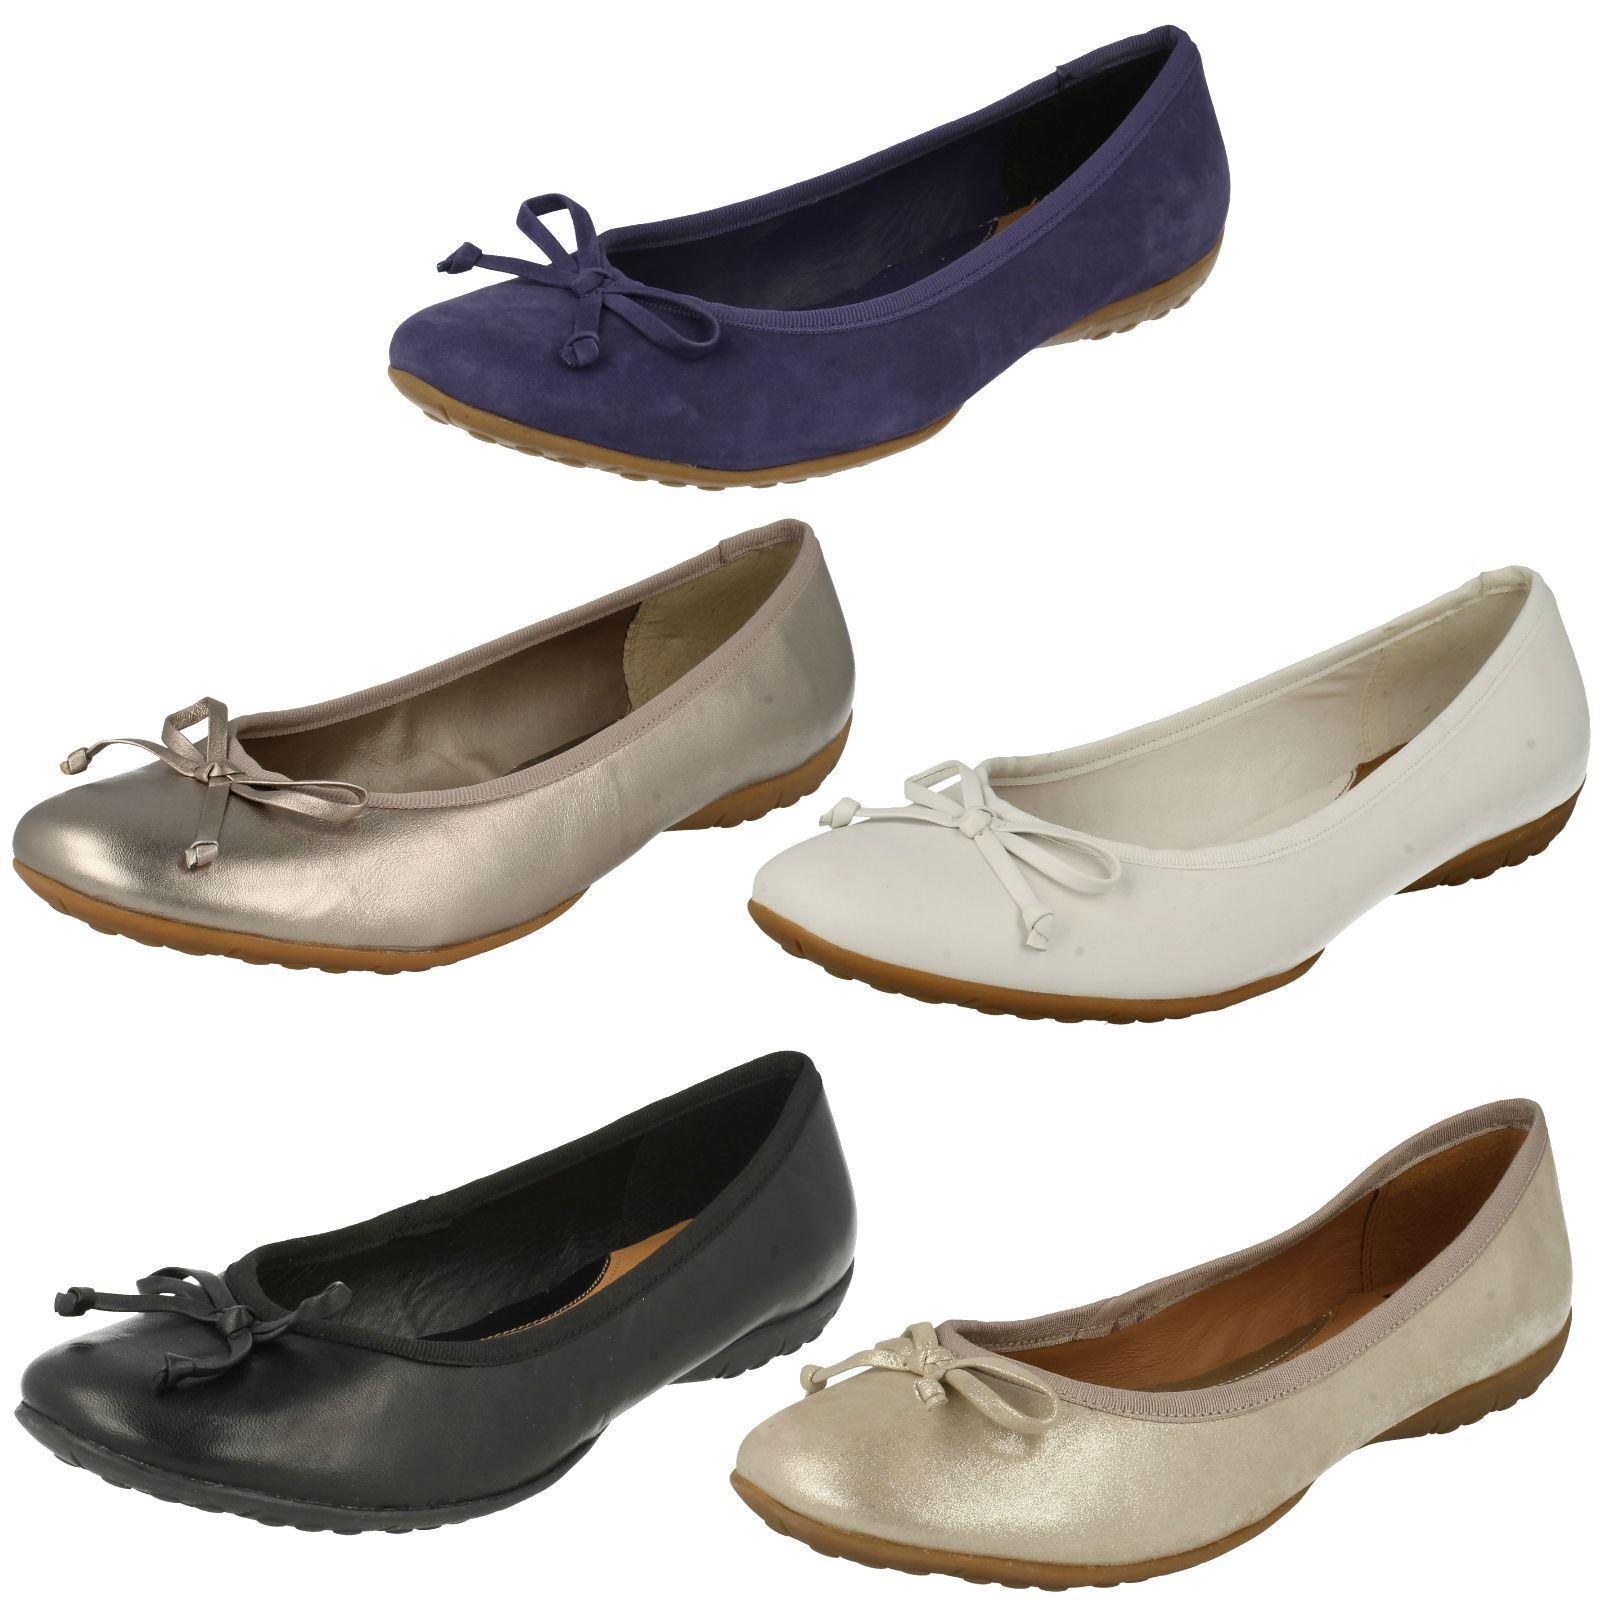 Ladies Clarks Slip On Bow Detailed Ballet Shoes 'Brizona Heat'